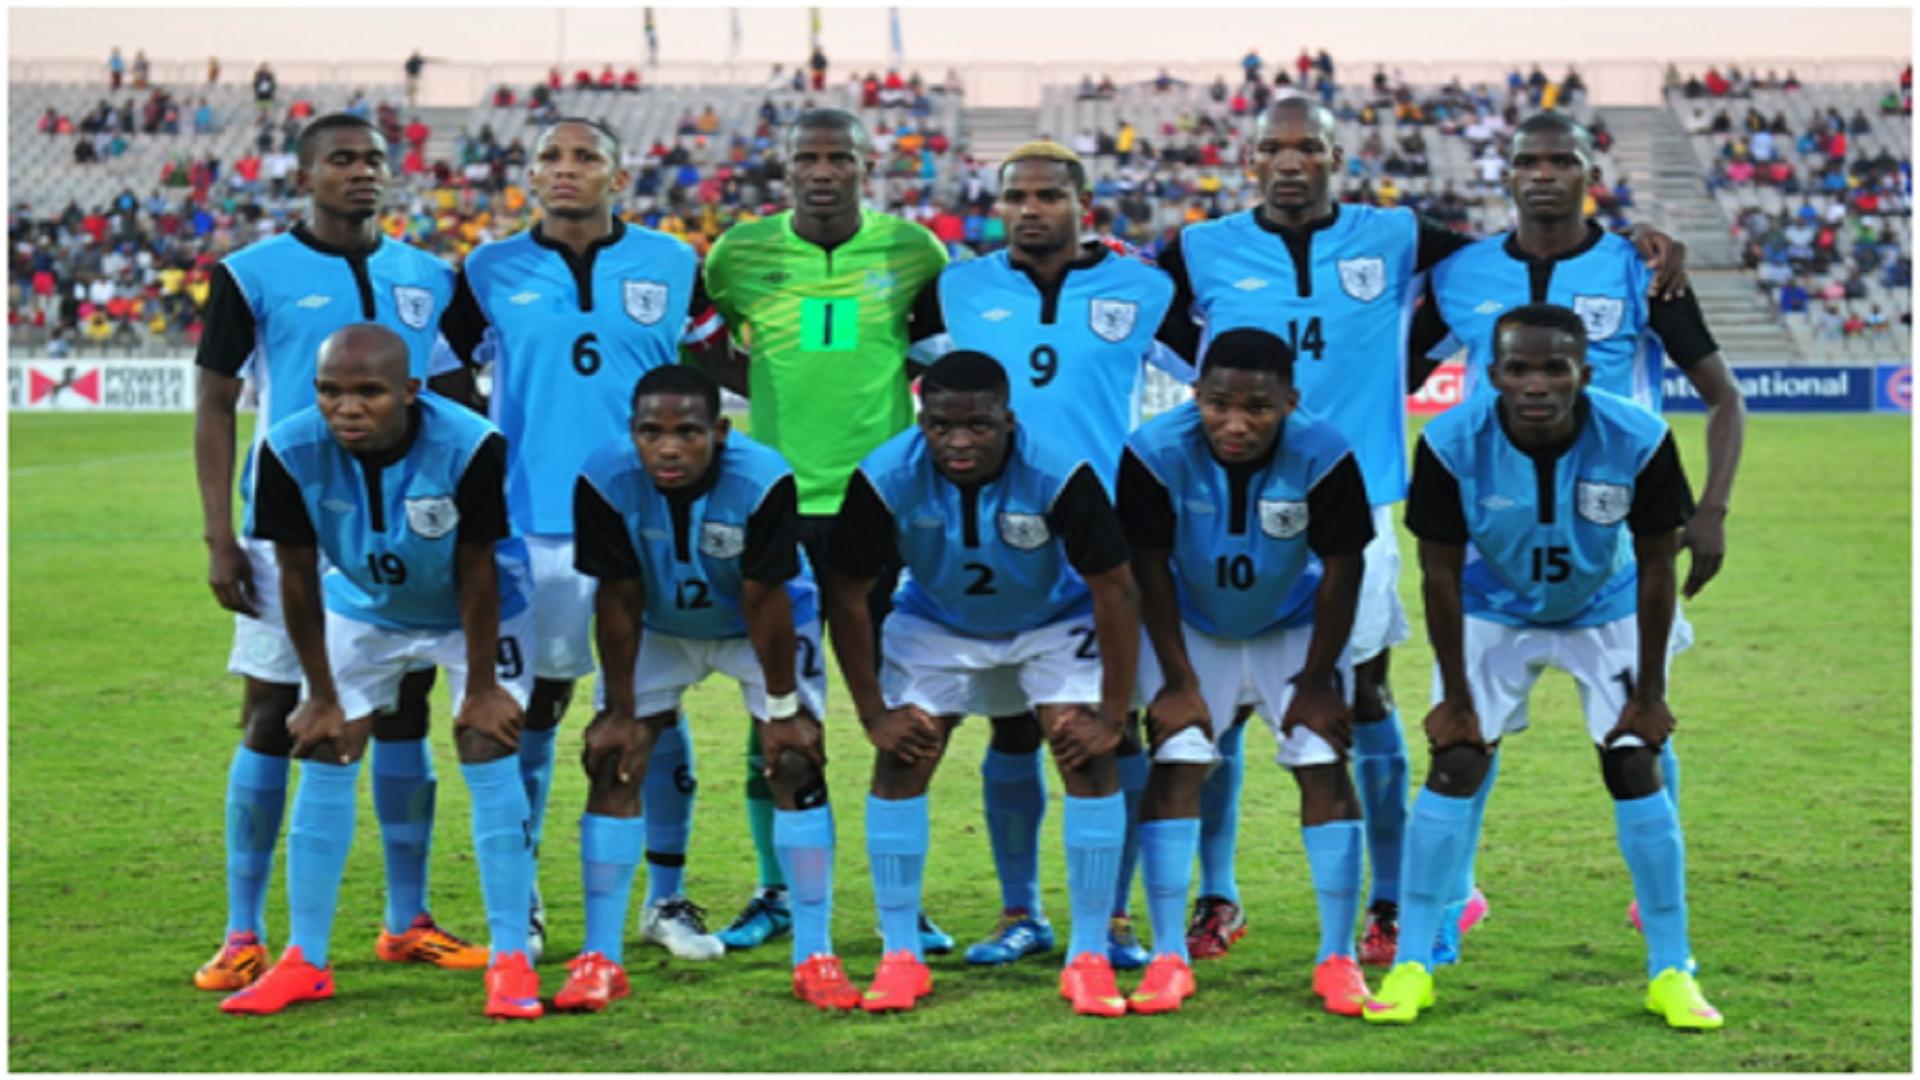 Botswana 24 may 2015 Cosafa Cup